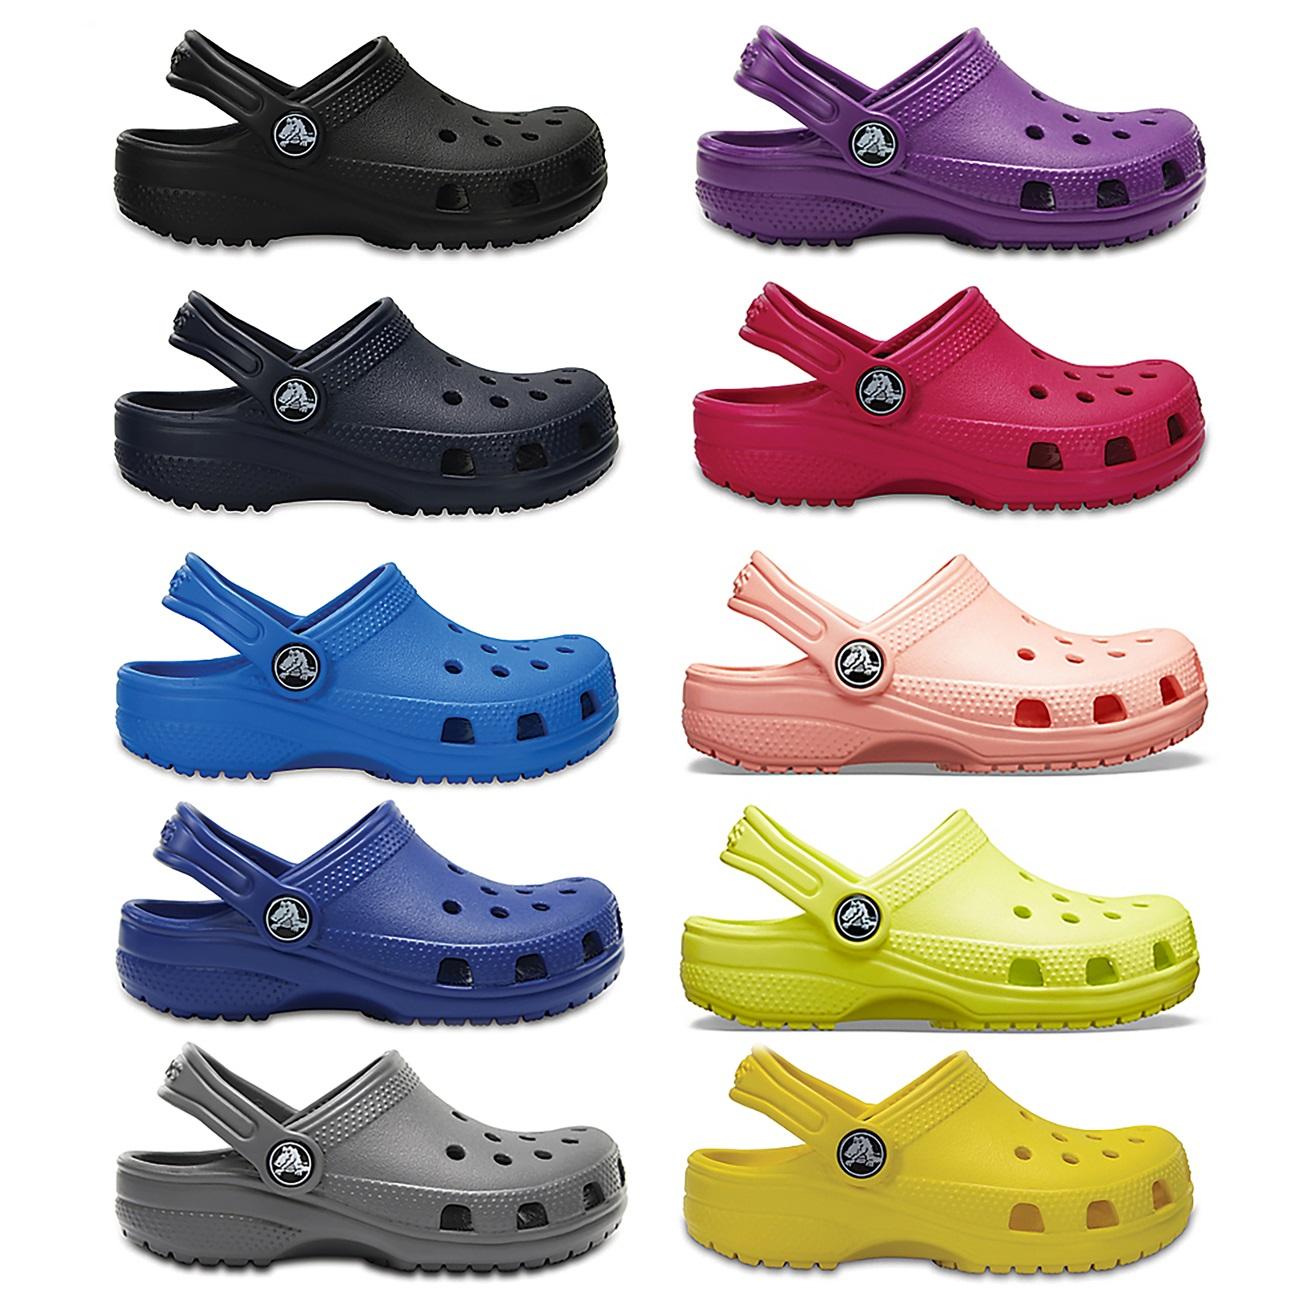 Crocs /'Classic/' Kid/'s Unisex Navy Slip On Rubber Summer Clogs